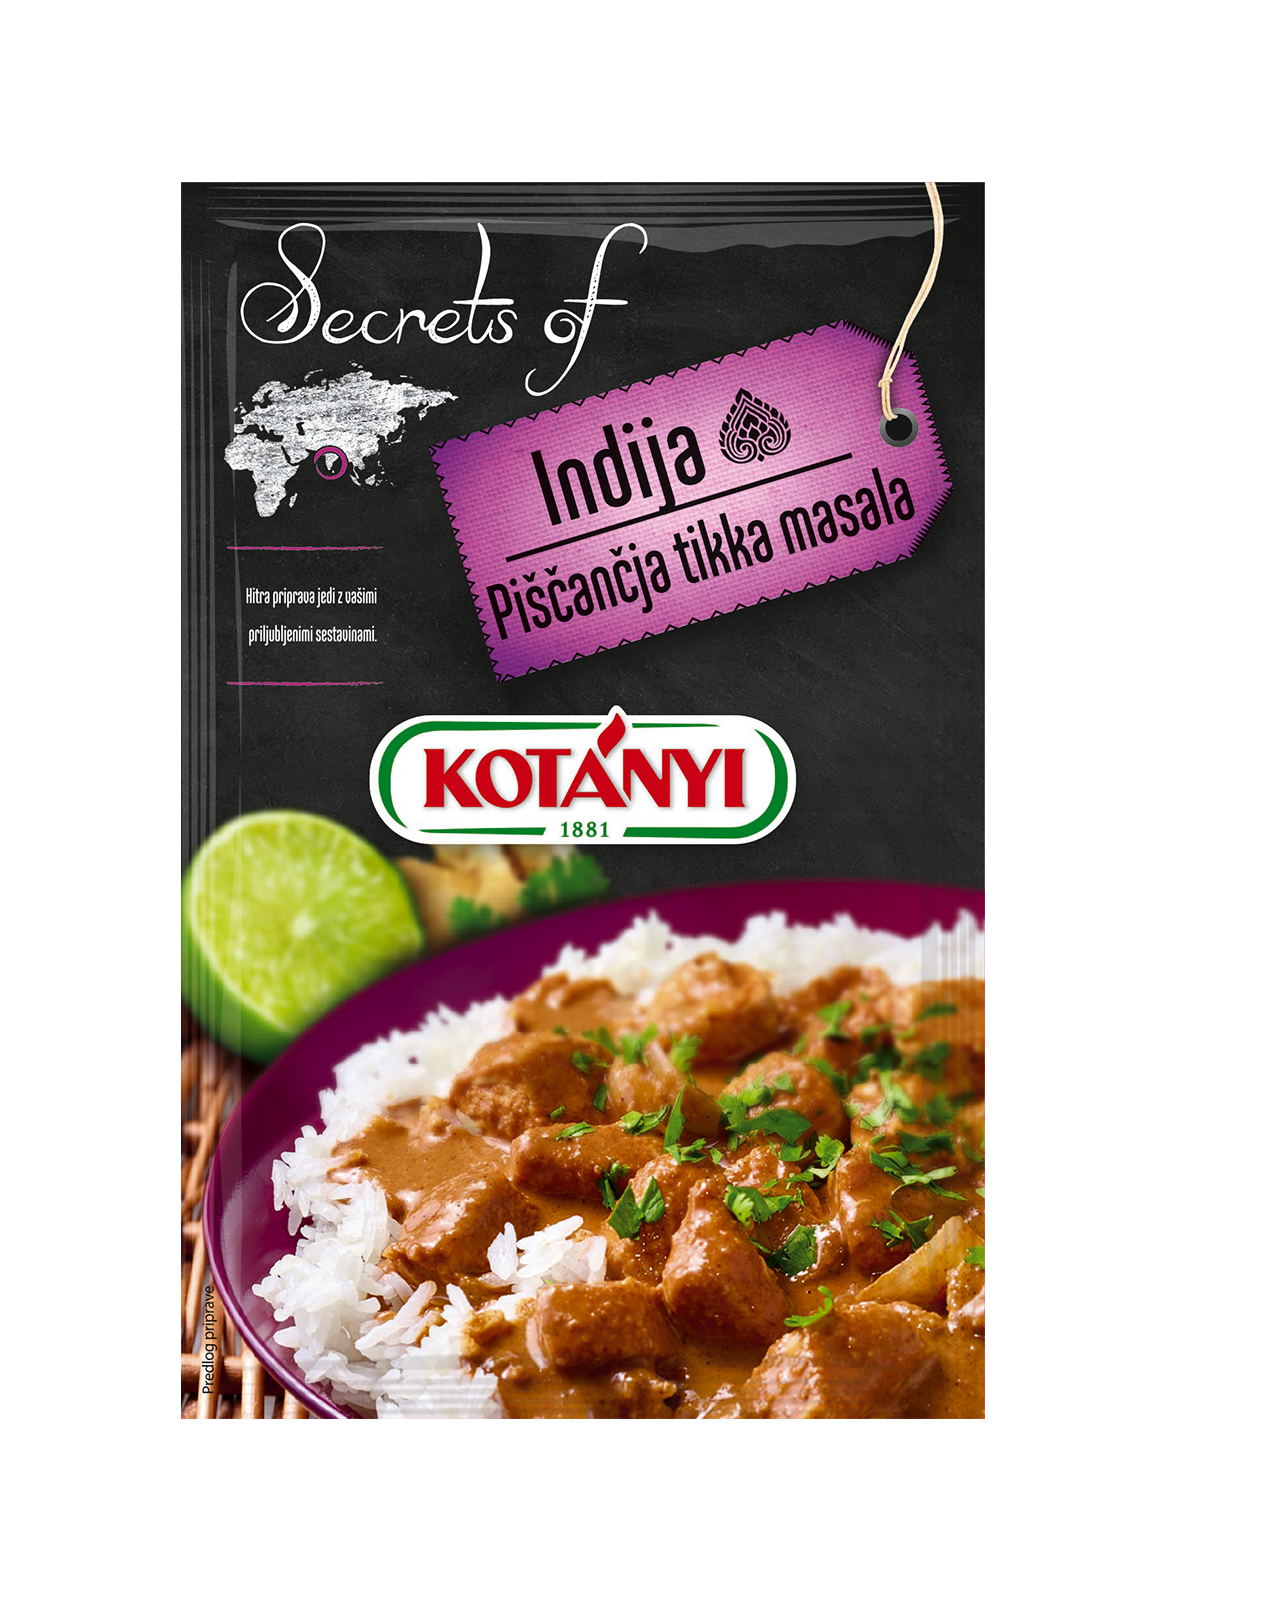 354906 Kotanyi Secrets Of Indija Piscancja Tikka Masala B2c Pouch